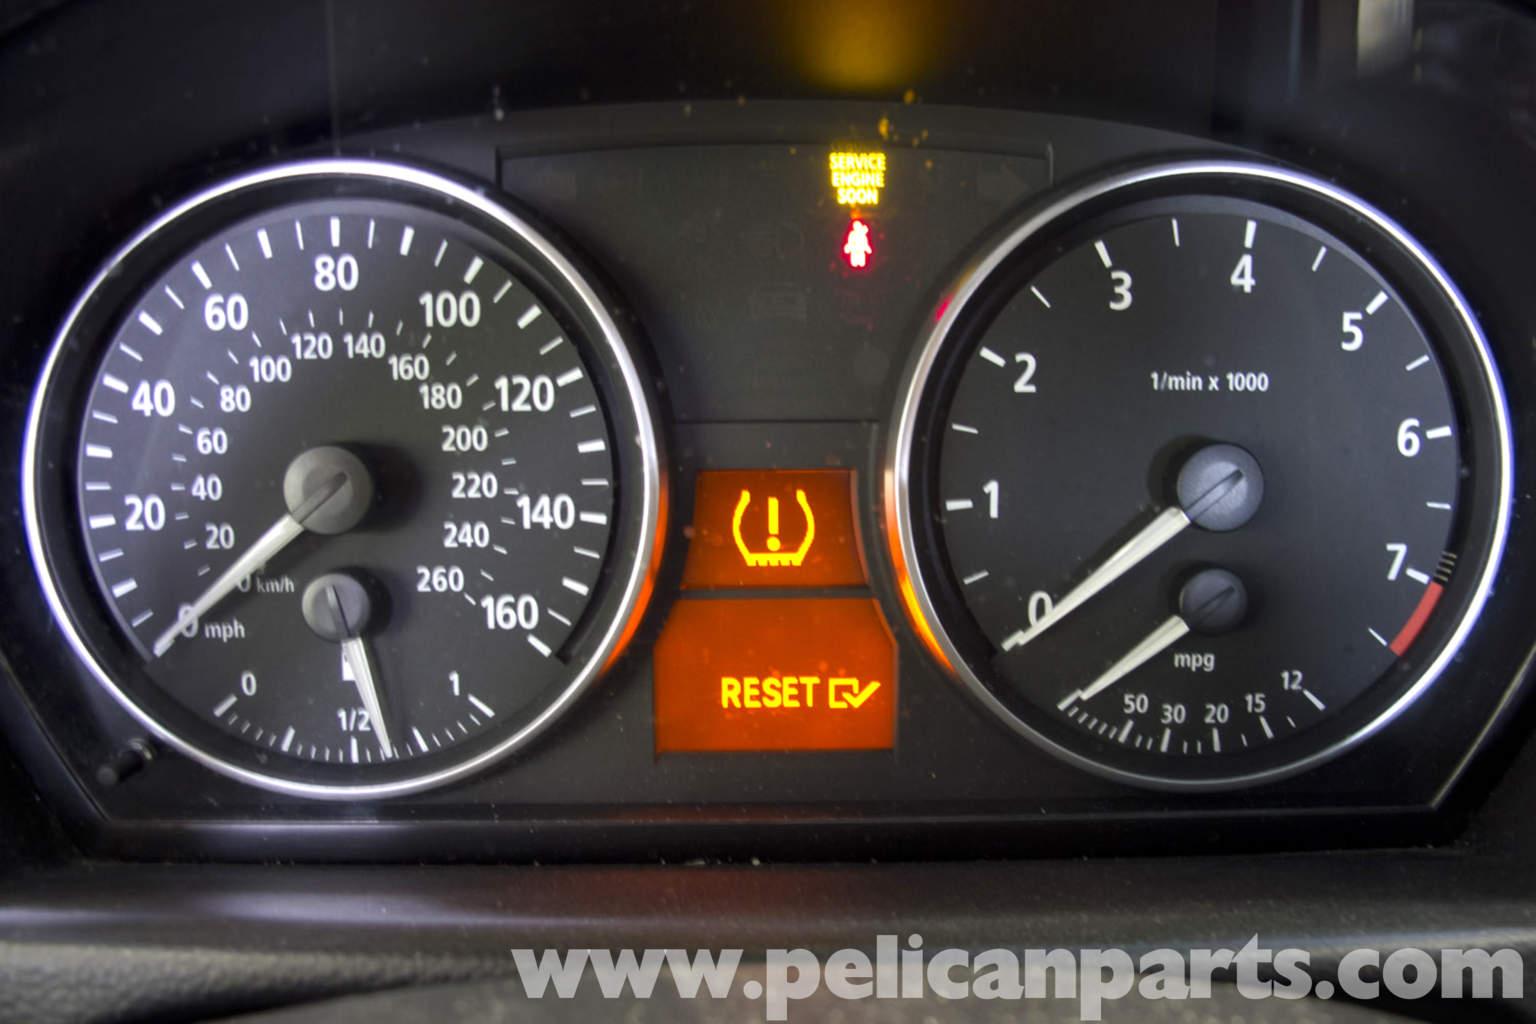 Bmw E90 Tire Pressure Warning Light Reset E91 E92 E93